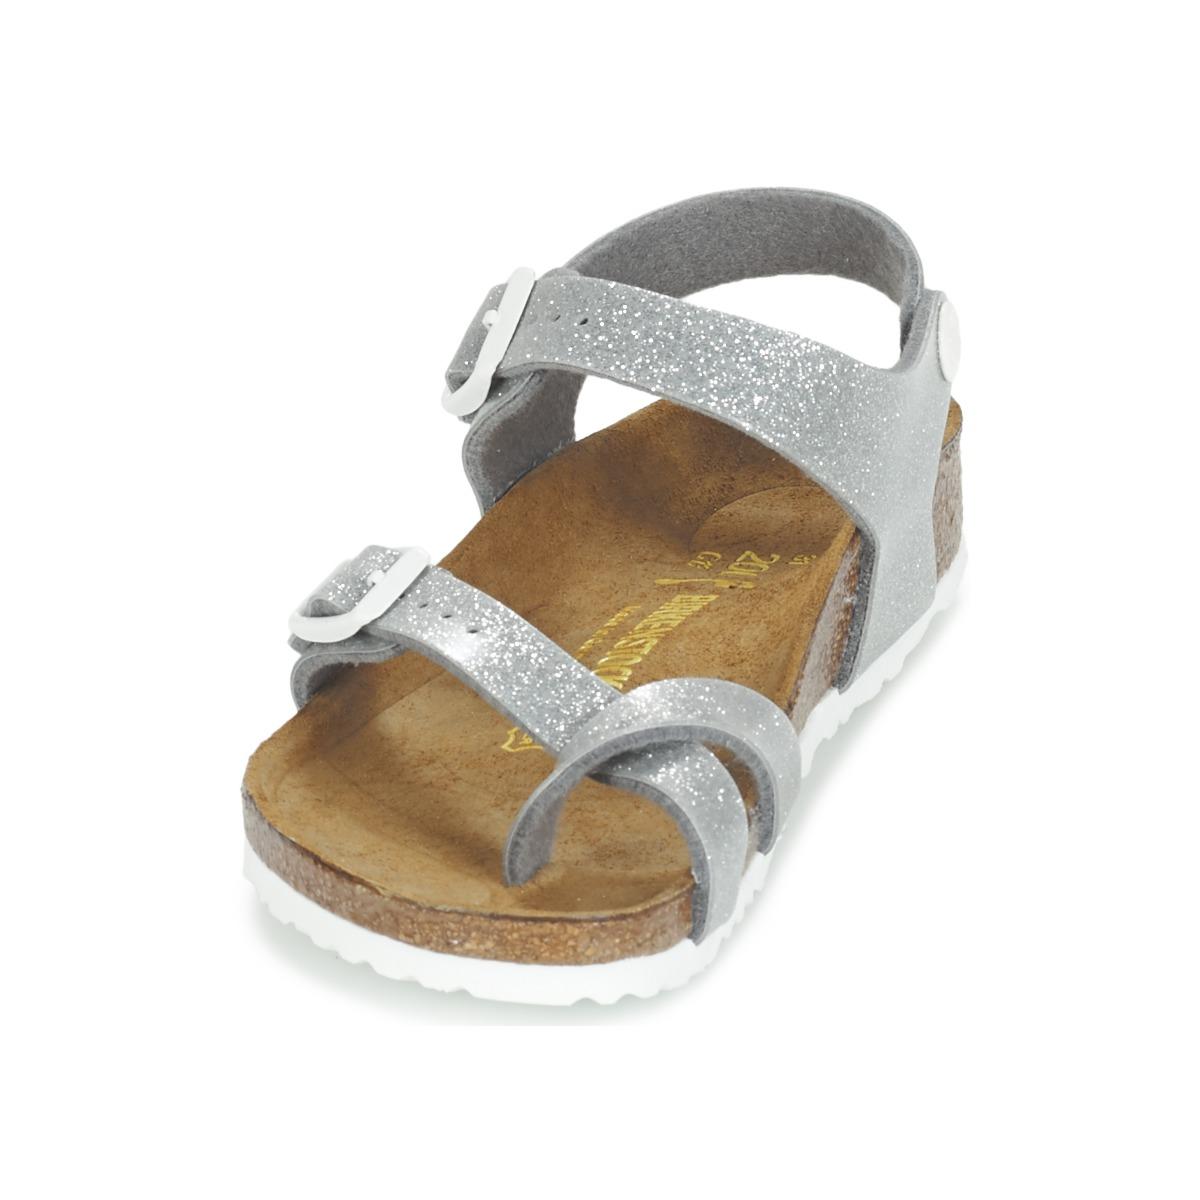 Birkenstock TAORMINA Silver Shoes Sandals Child hot sale 2017 ... d8293870867